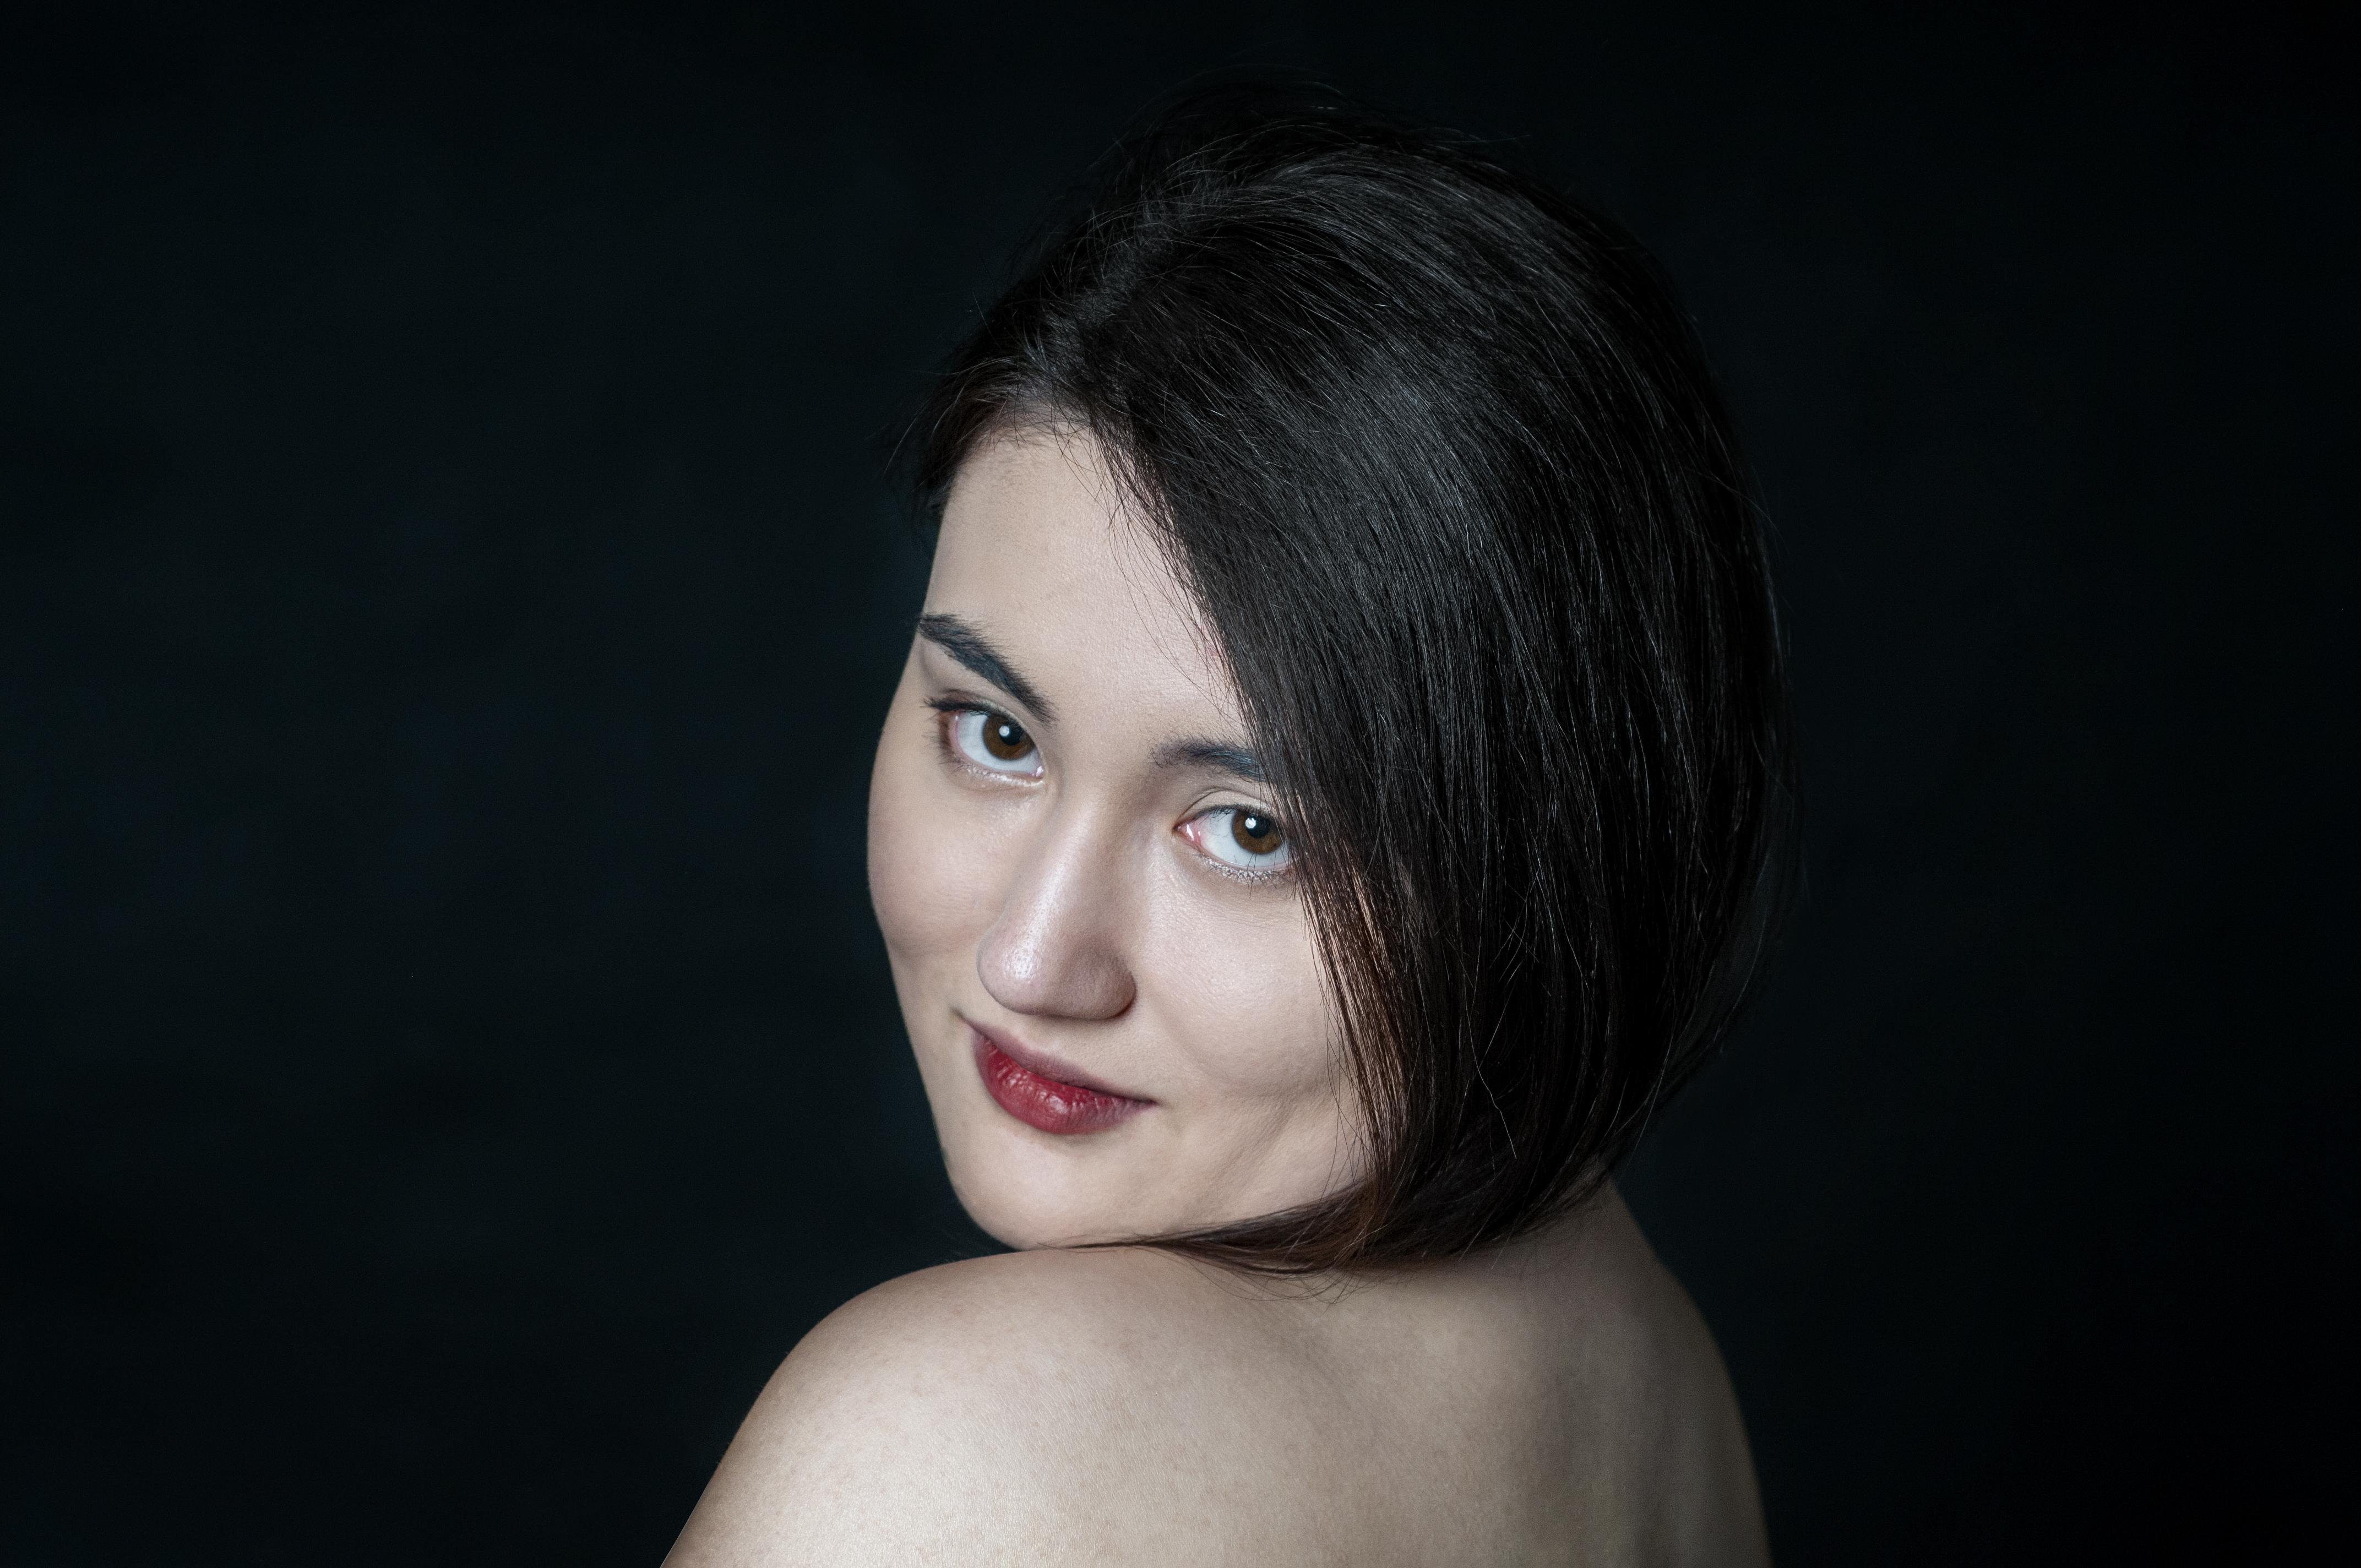 portret_6